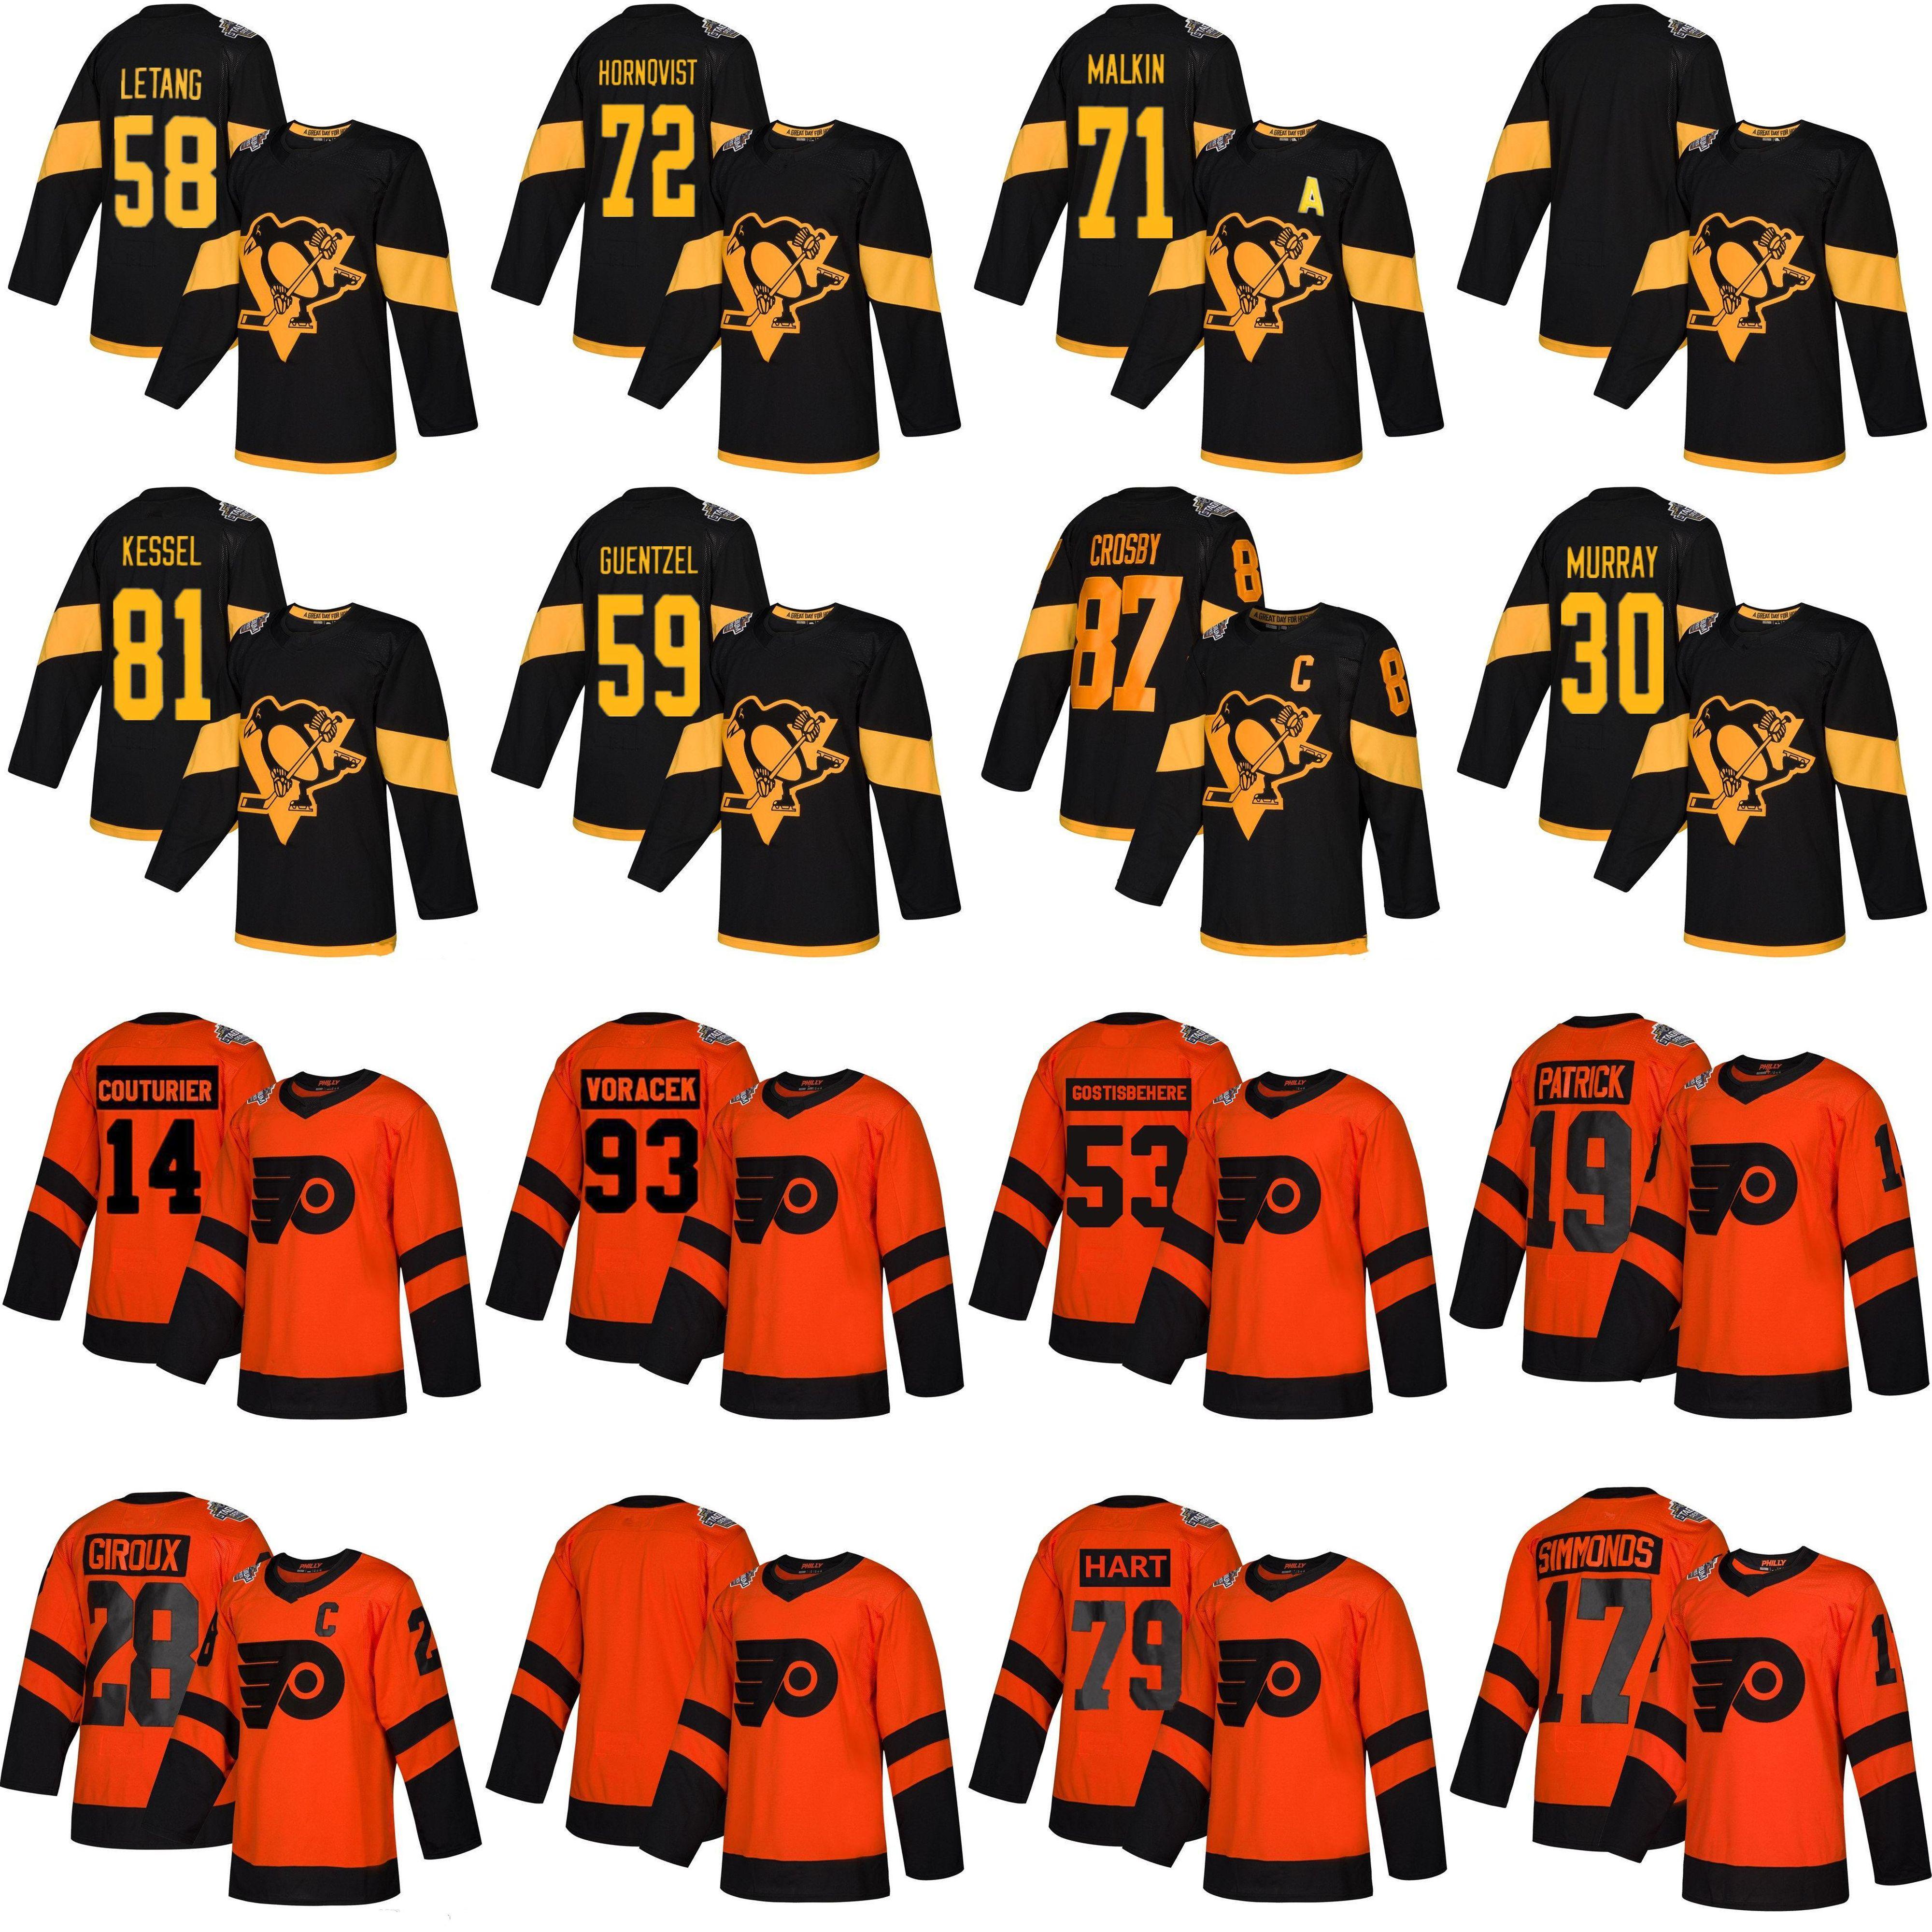 2019 Stadium Series Pittsburgh Penguins Philadelphia Flyers Hockey Jerseys 81 Phil Kessel 59 Jake Güentzel 58 Kris Letang 72 Patric Hornqvis